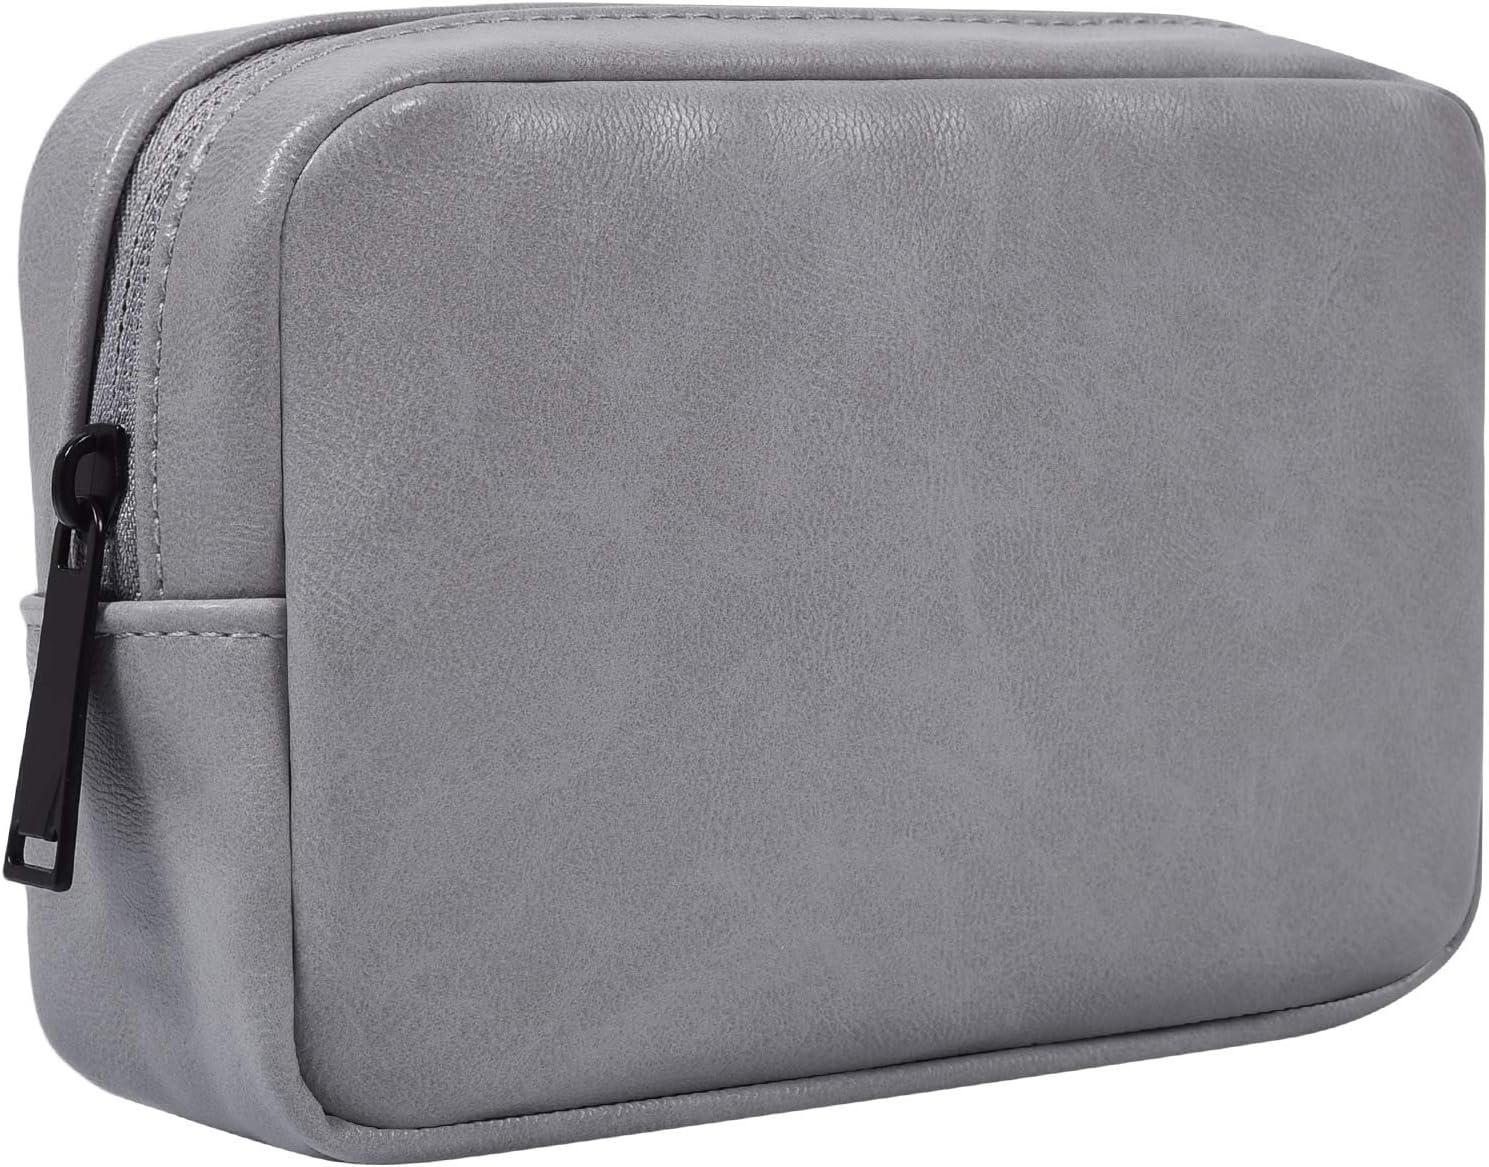 Electronic Accessories Storage Bag, Premium PU Leather Multifunctional Travel Digital Accessories Storage Bag Cable Organizer Bag, Grey